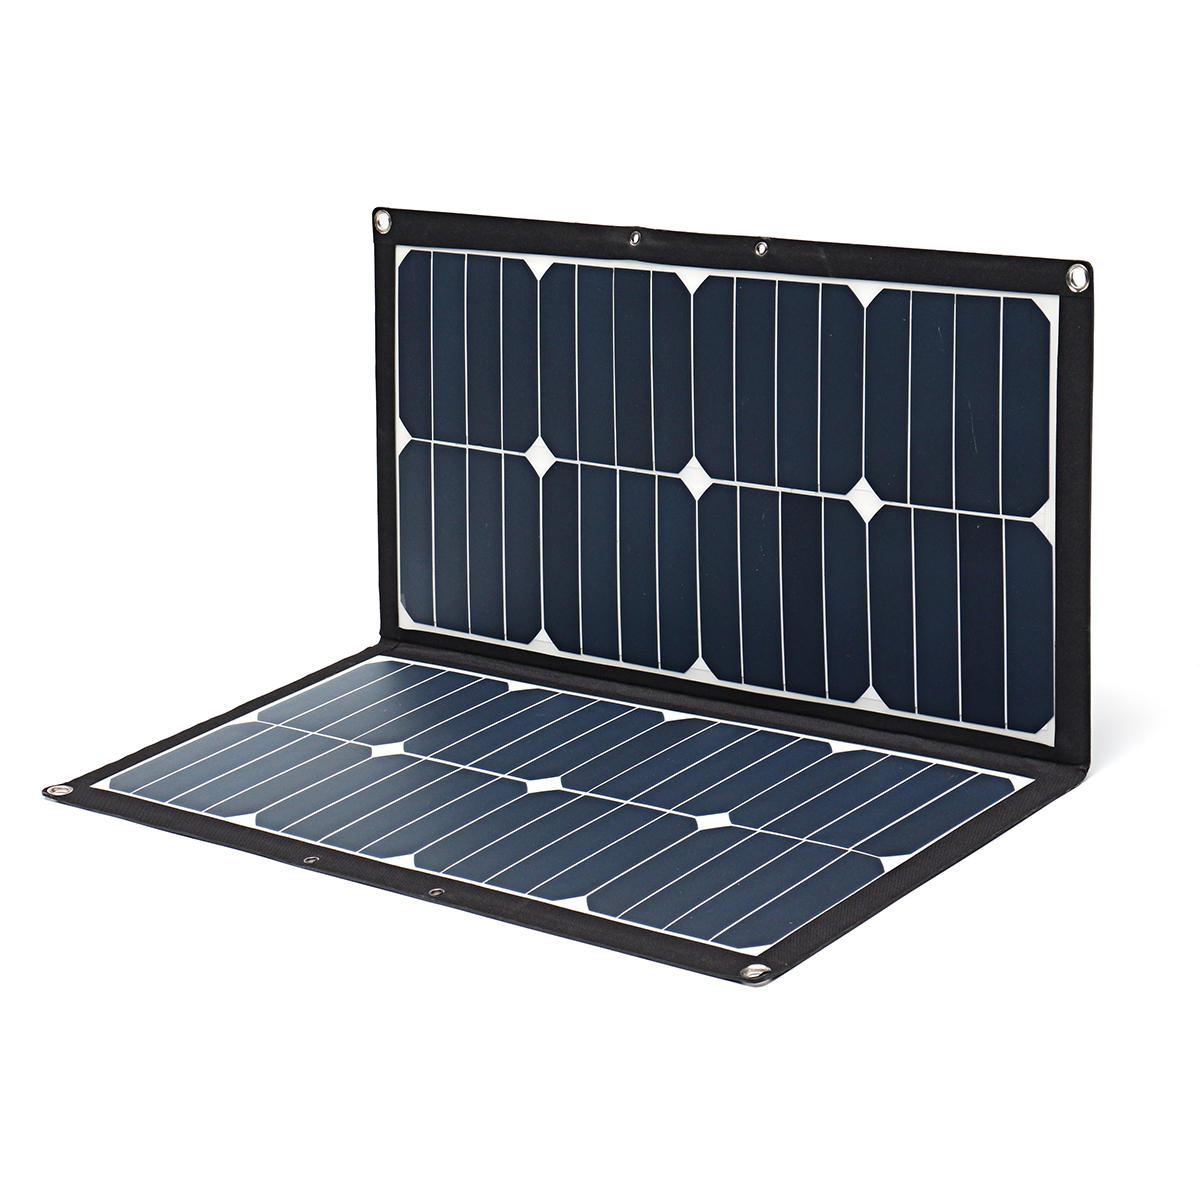 5V/18V 55W 3.1V/2.1A USB Interface Solar Folding Bag Portable Photovoltaic Power Solar Panel Package